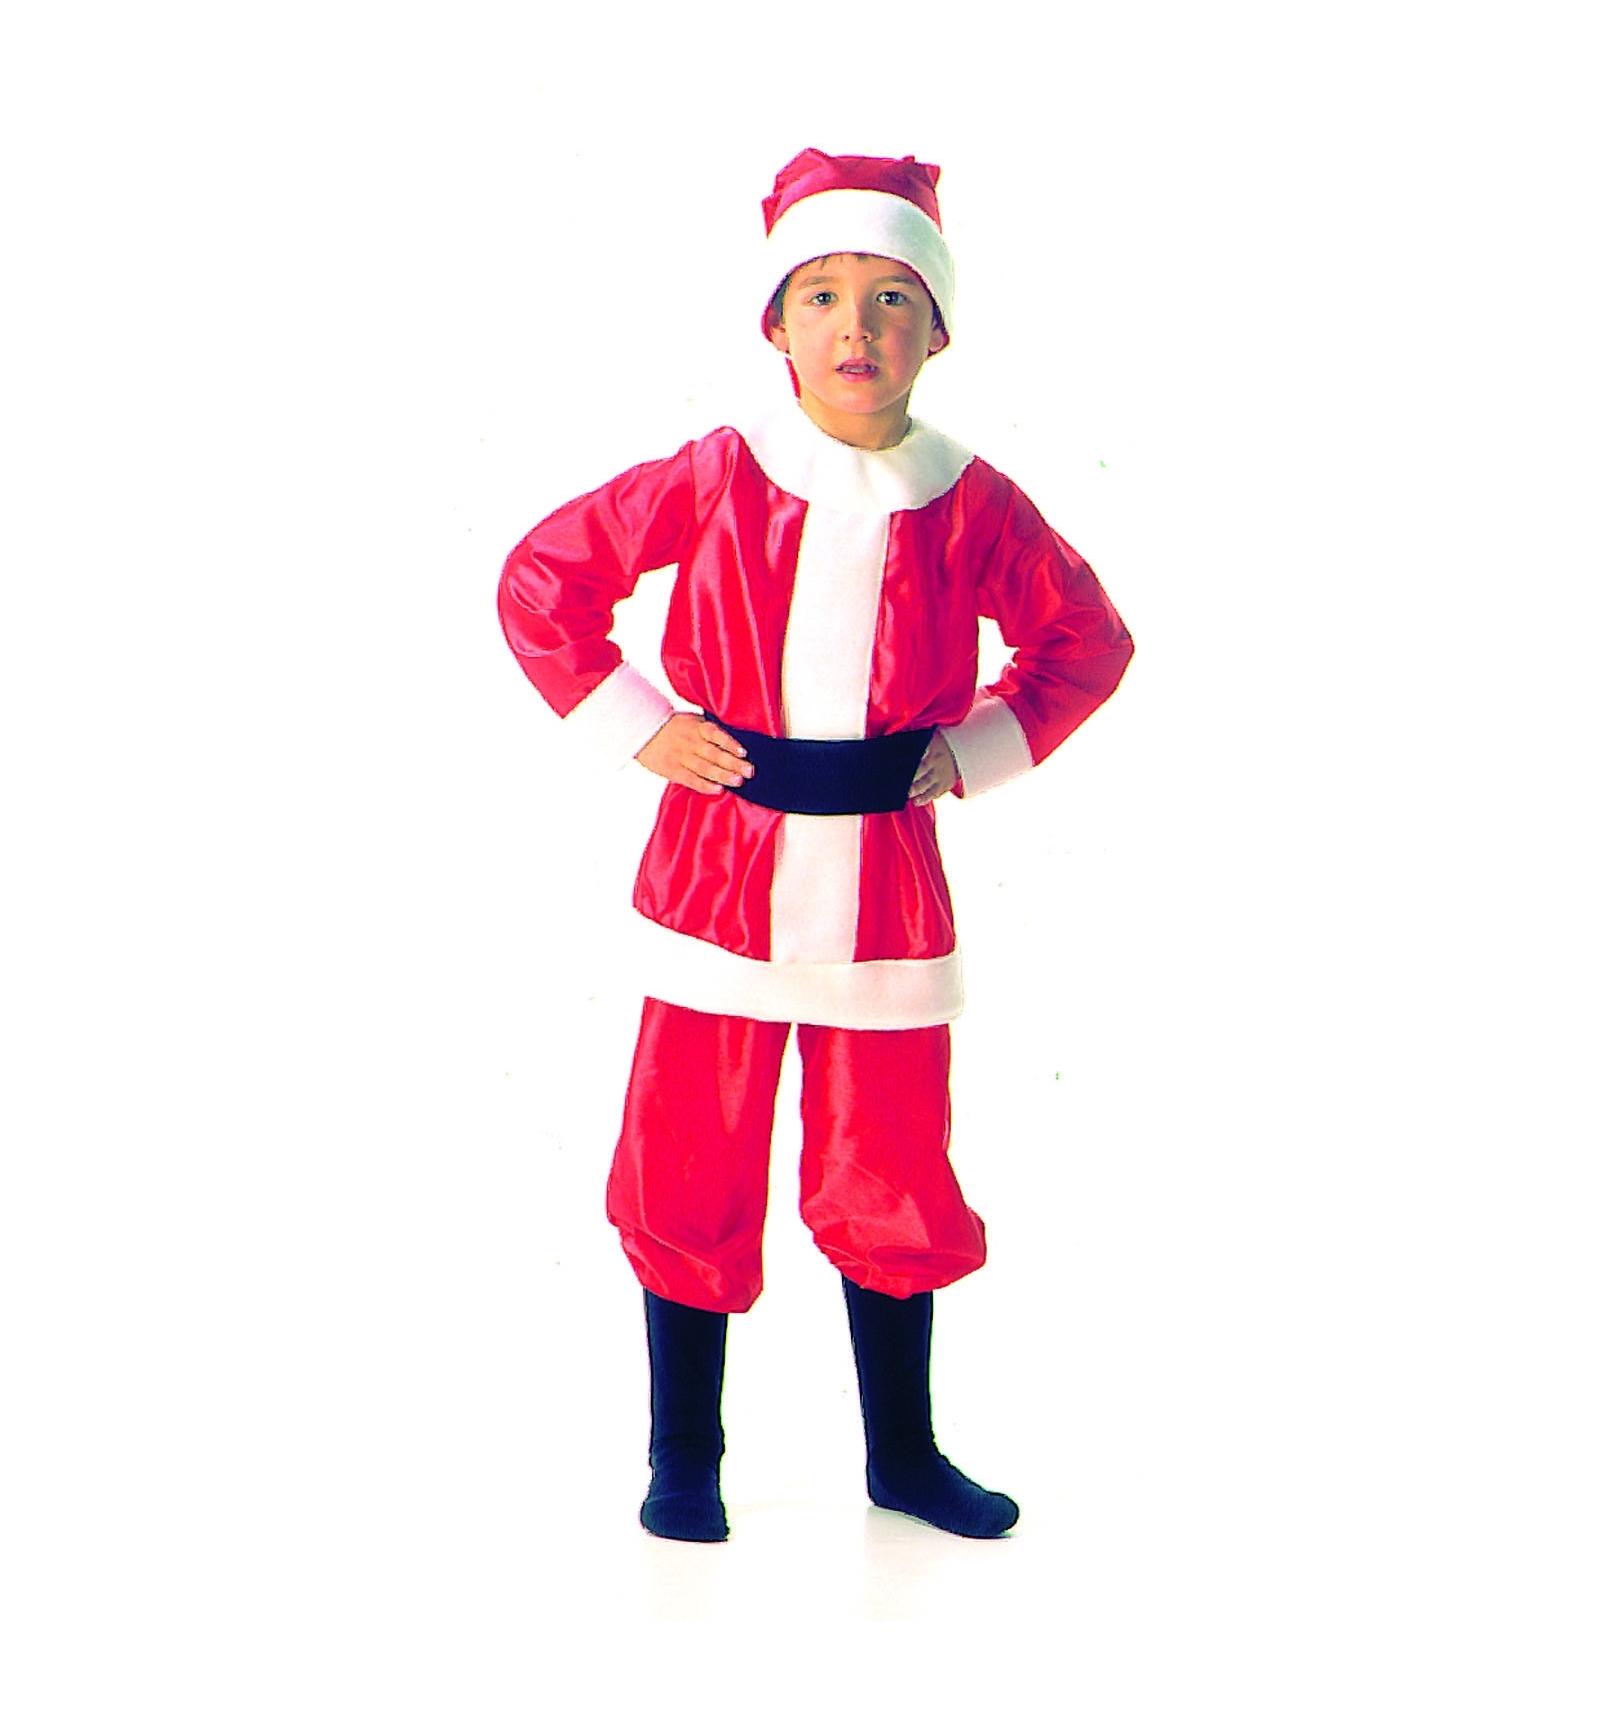 2dbd97dacd5fc DISFRAZ PAPA NOEL BEBE - Your Online Costume Store